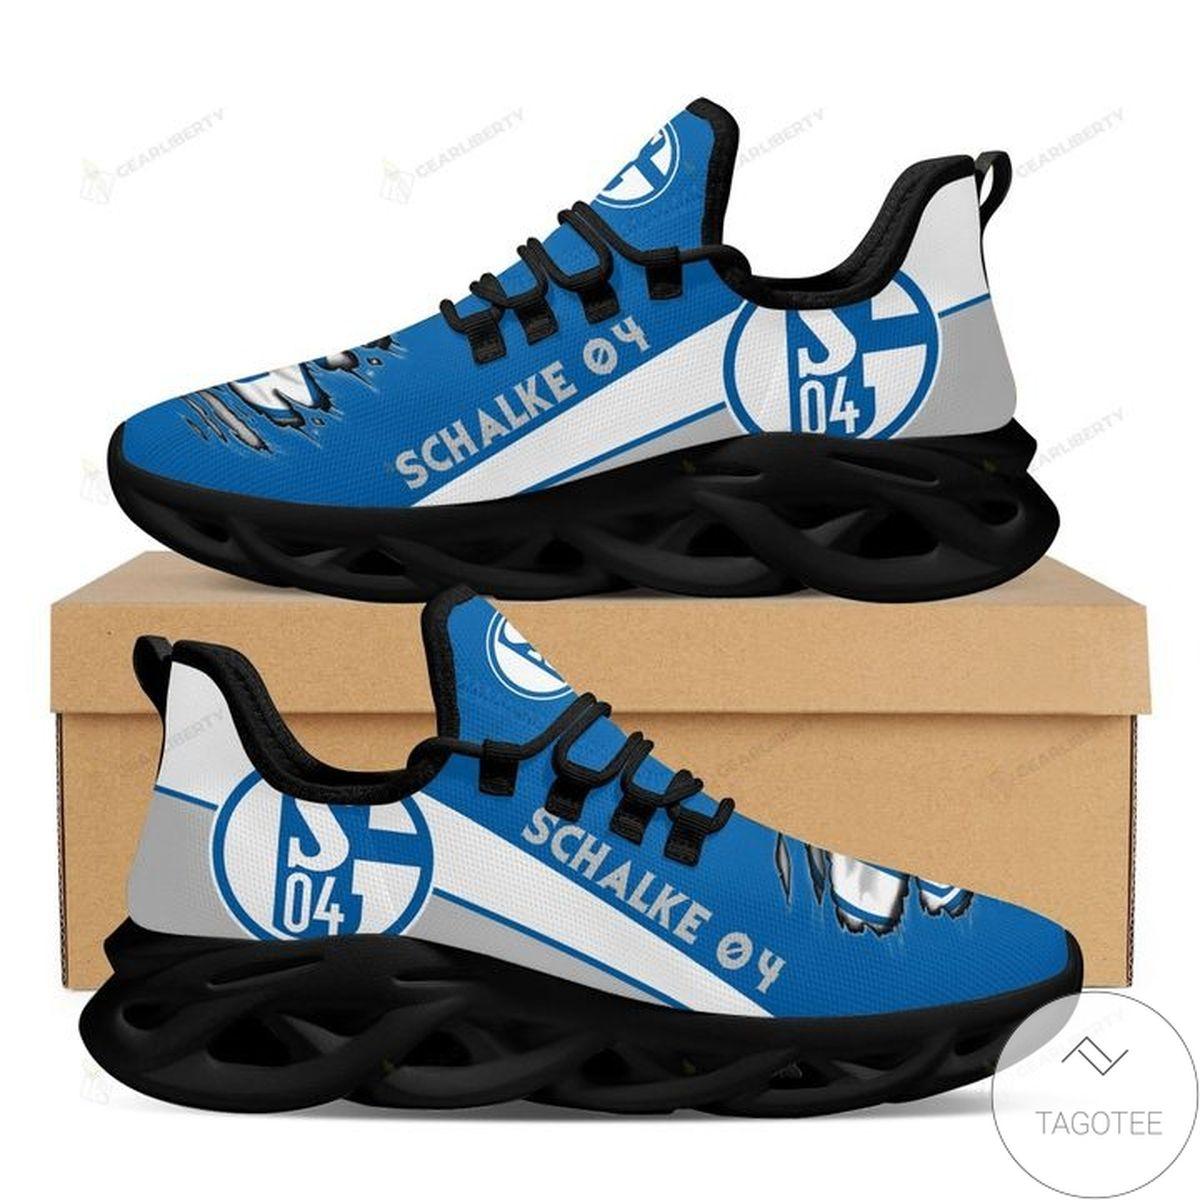 Bundesliga Schalke 04 Max Soul Shoes z